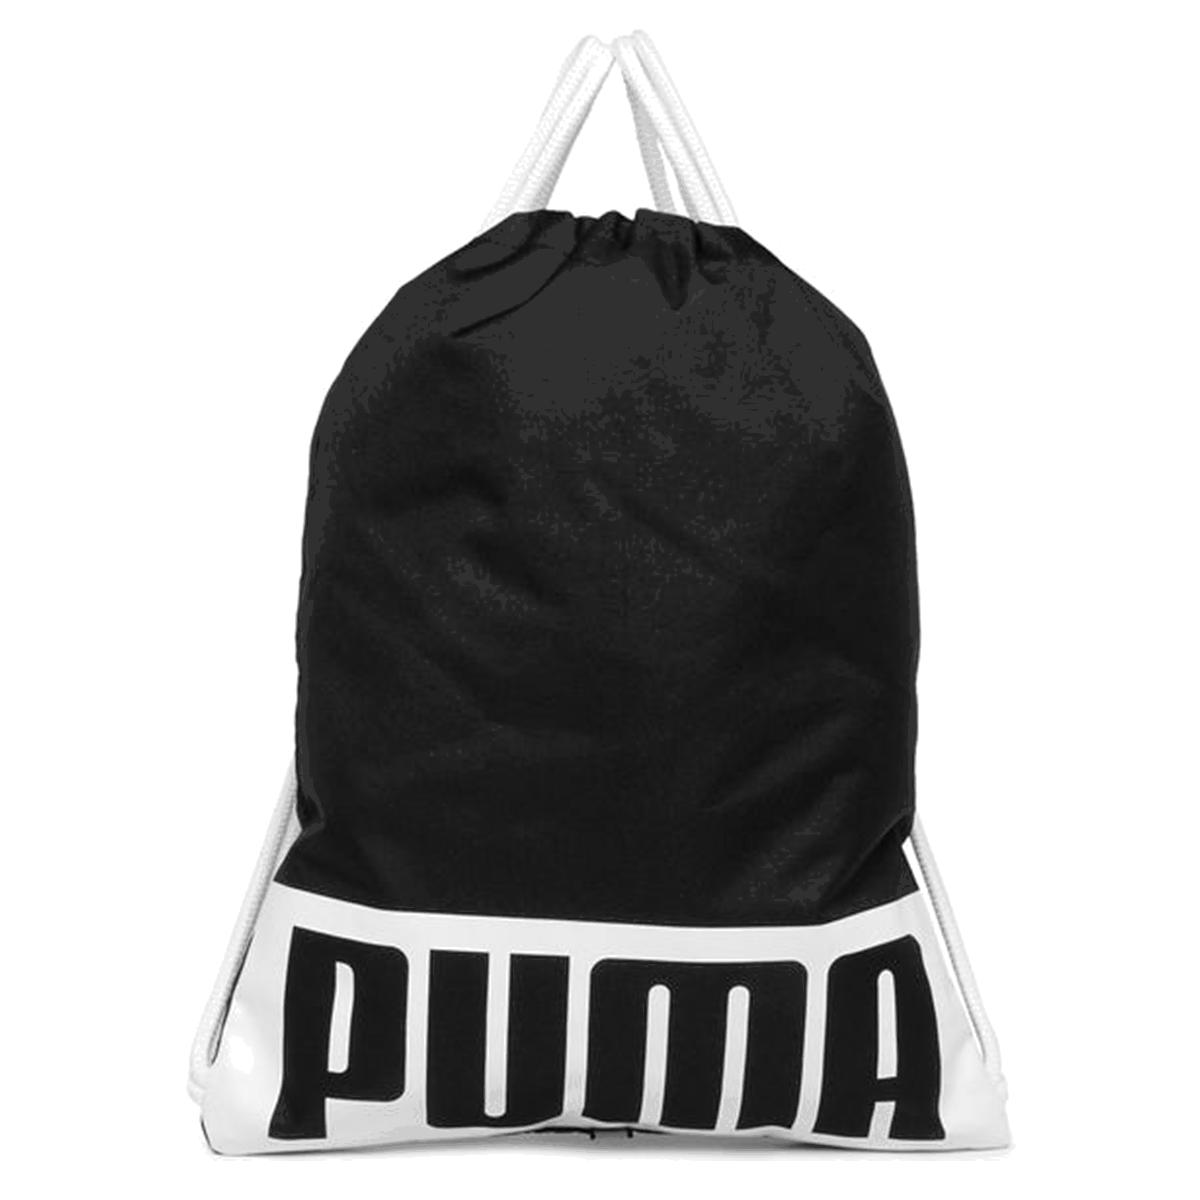 Mochila Sacola Puma Gymsack Deck - Preto